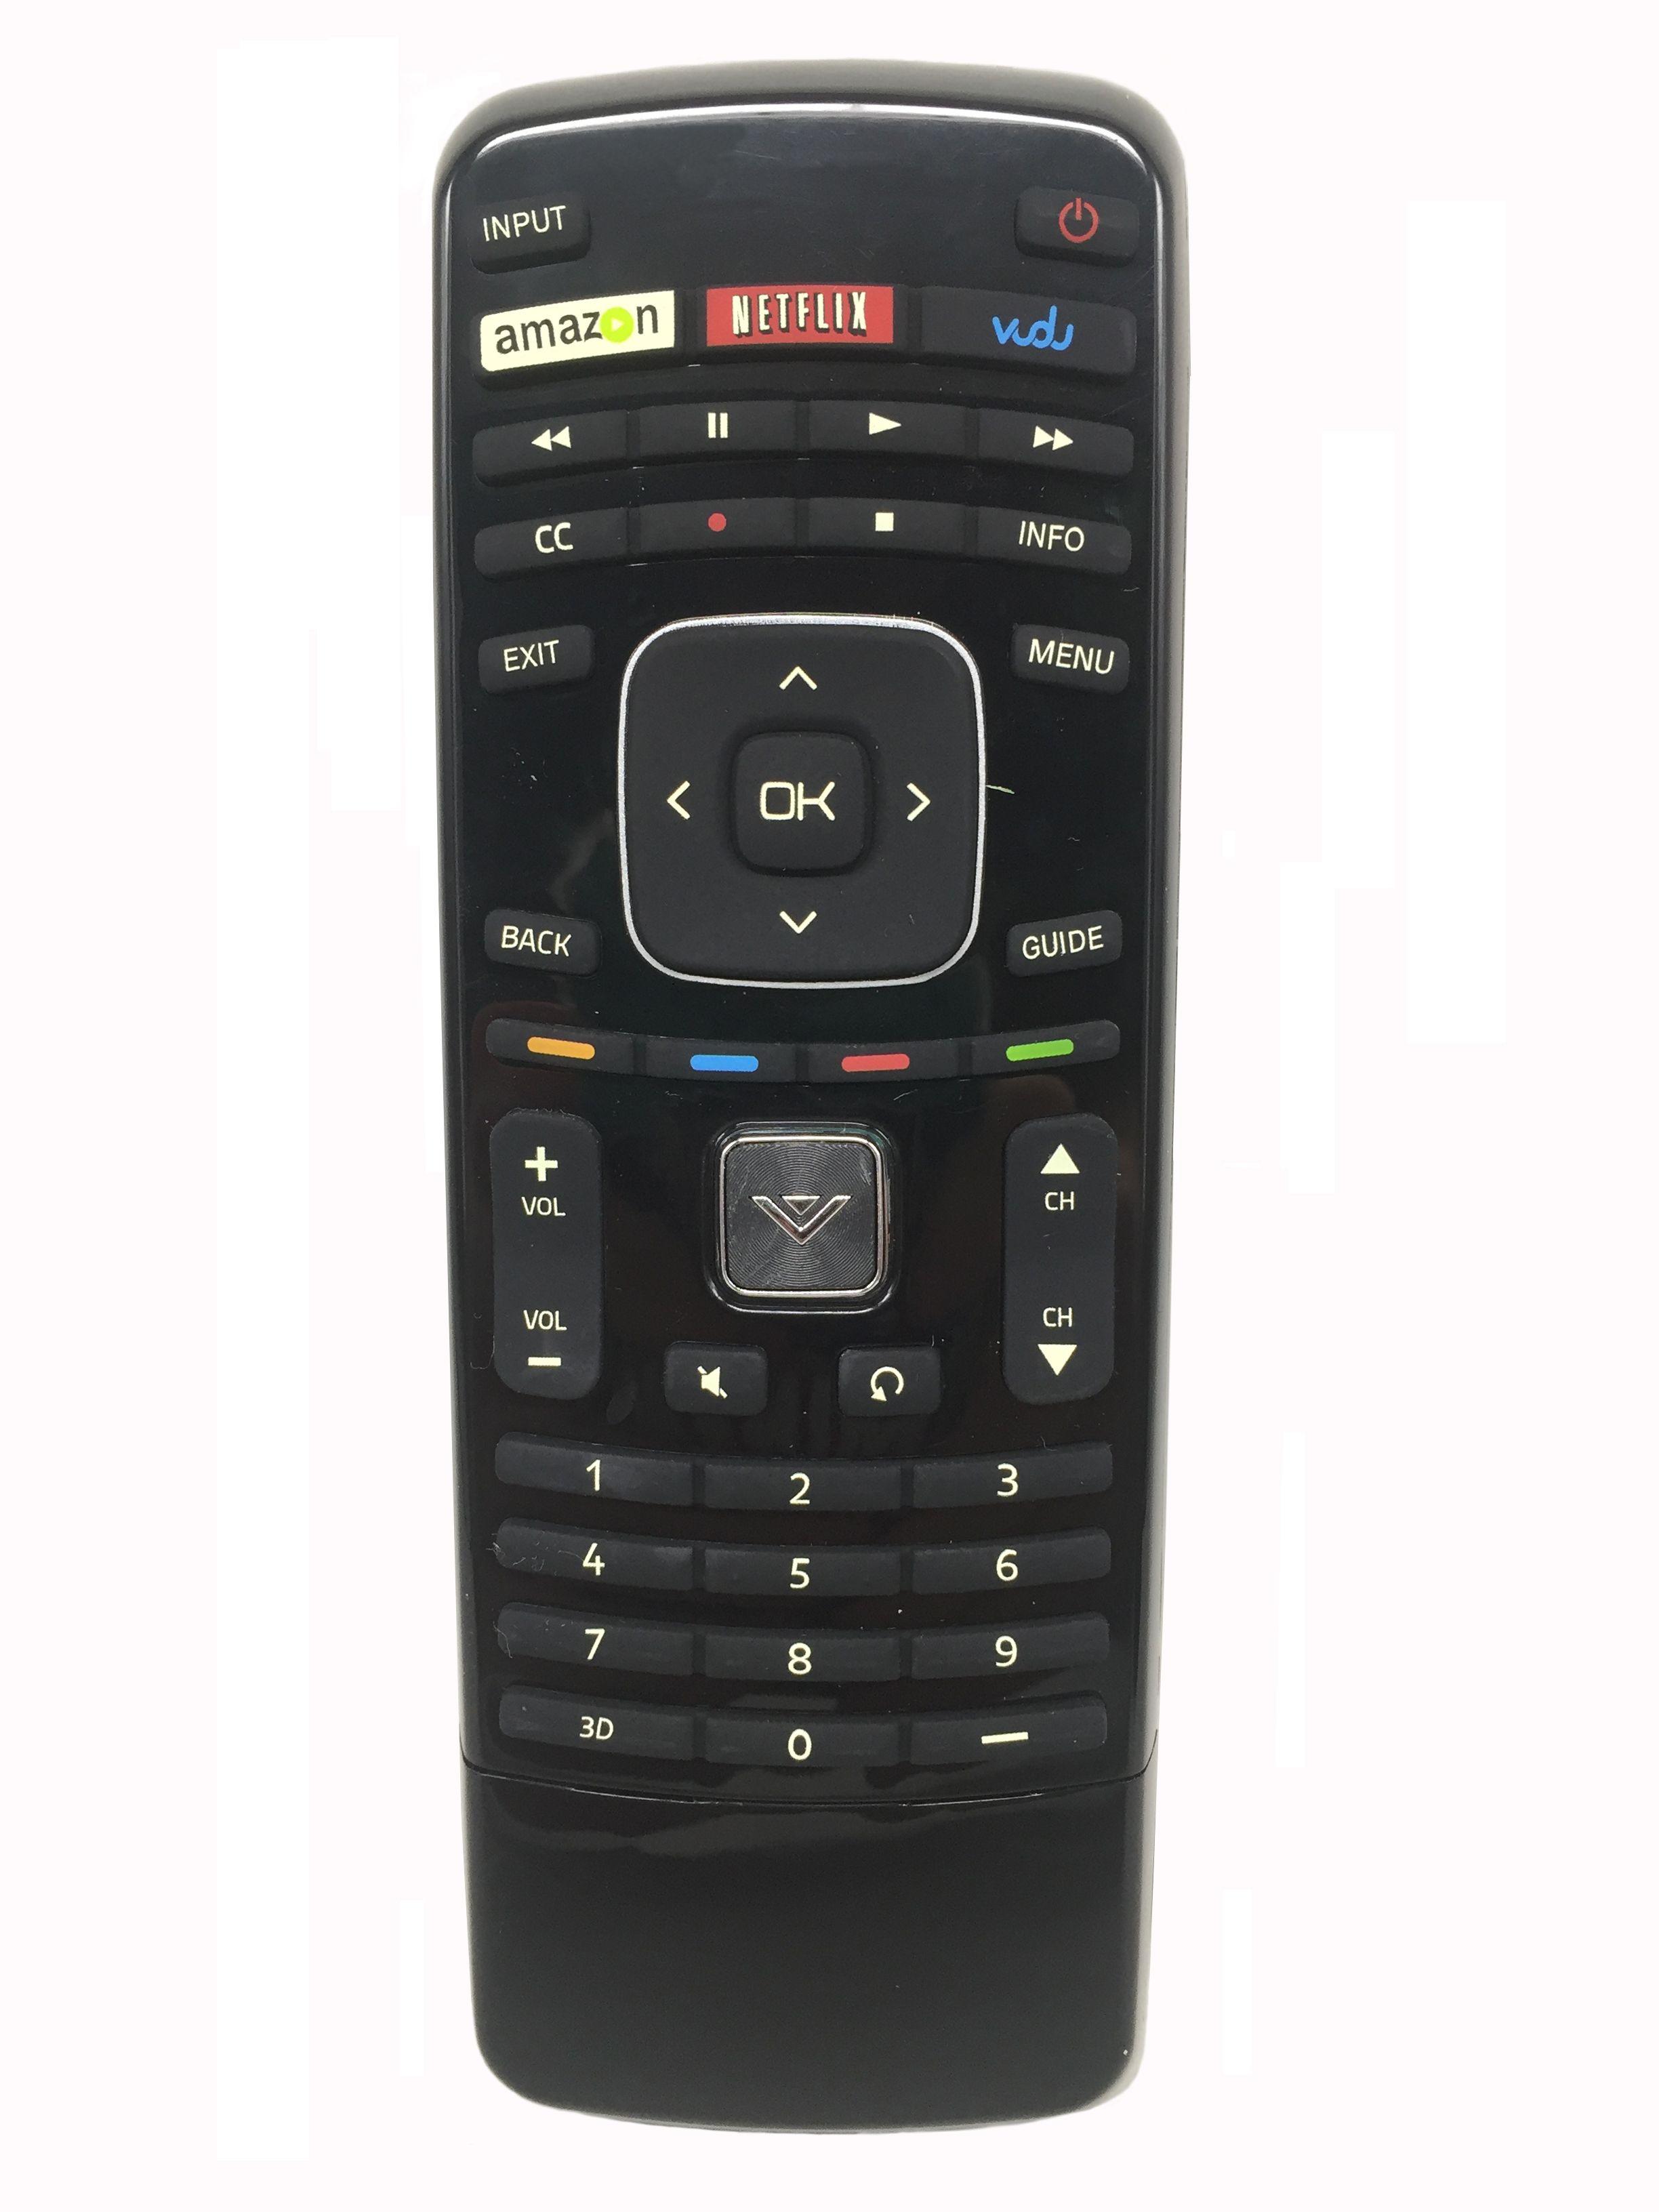 XRT301 Remote Control for Vizio Smart 3D TV HDTVMeide